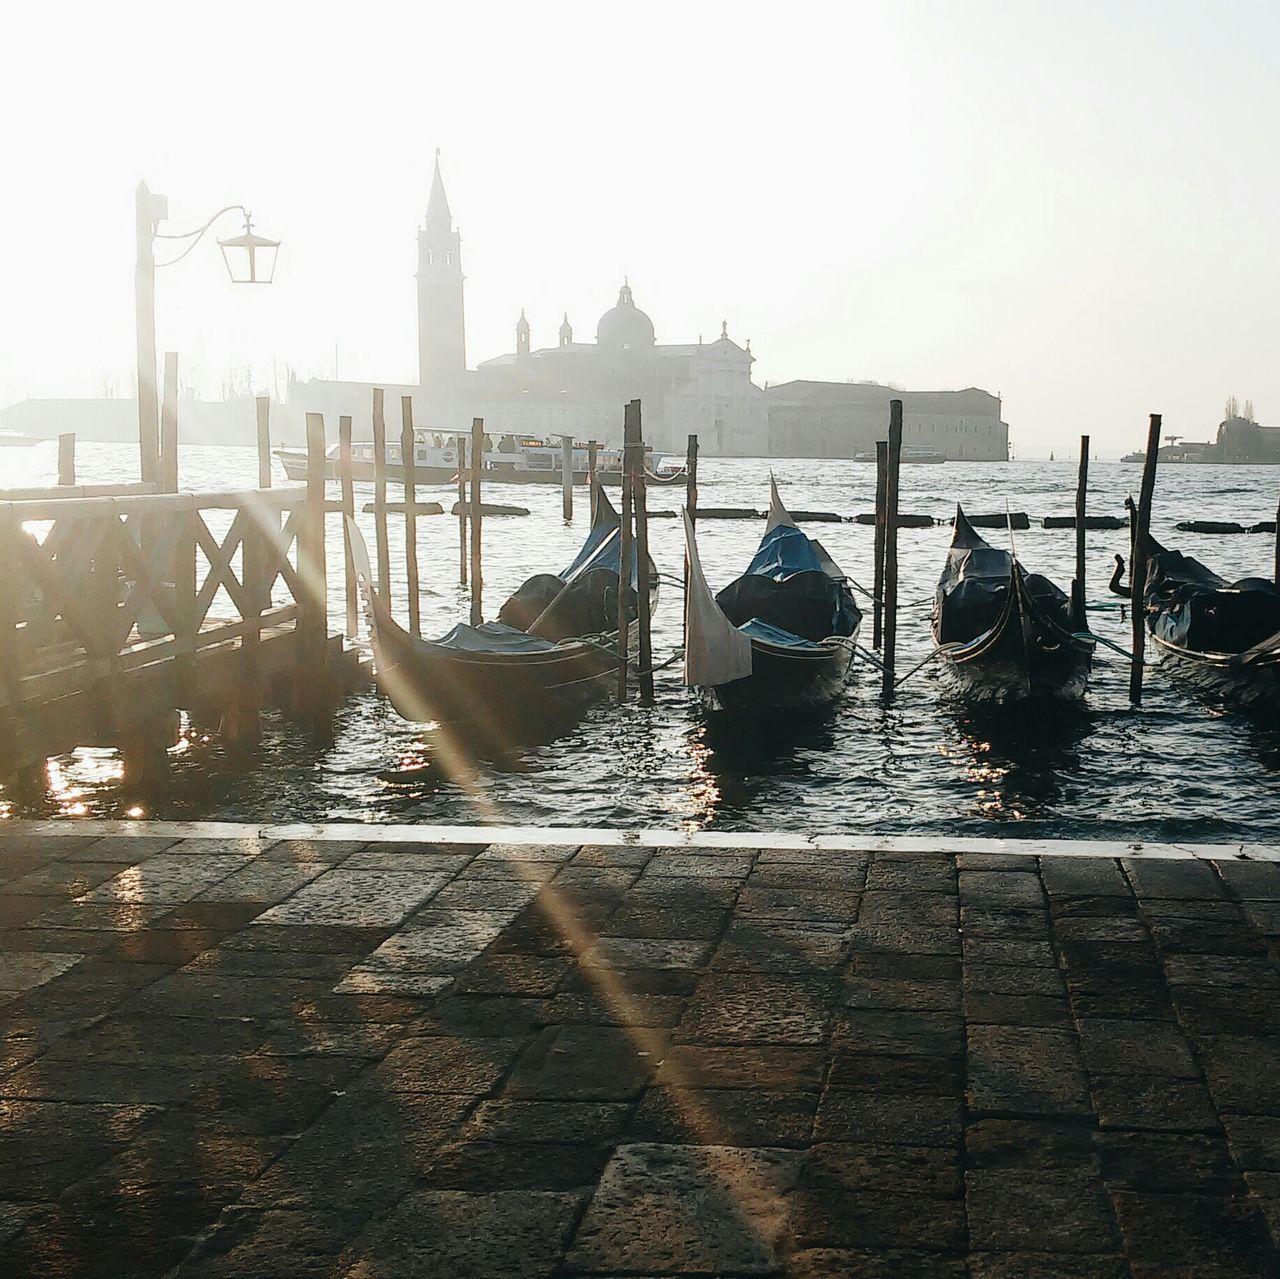 Water Gondola - Traditional Boat Sea Canal Palazzoducale Veneziagram Venezia Venice, ıtaly Venezia Italia Tourism EyeEm Best Edits Travelgram OpenEdit EyeEm Best Shots Travelphotography Eyeemtravel  Italia Italy